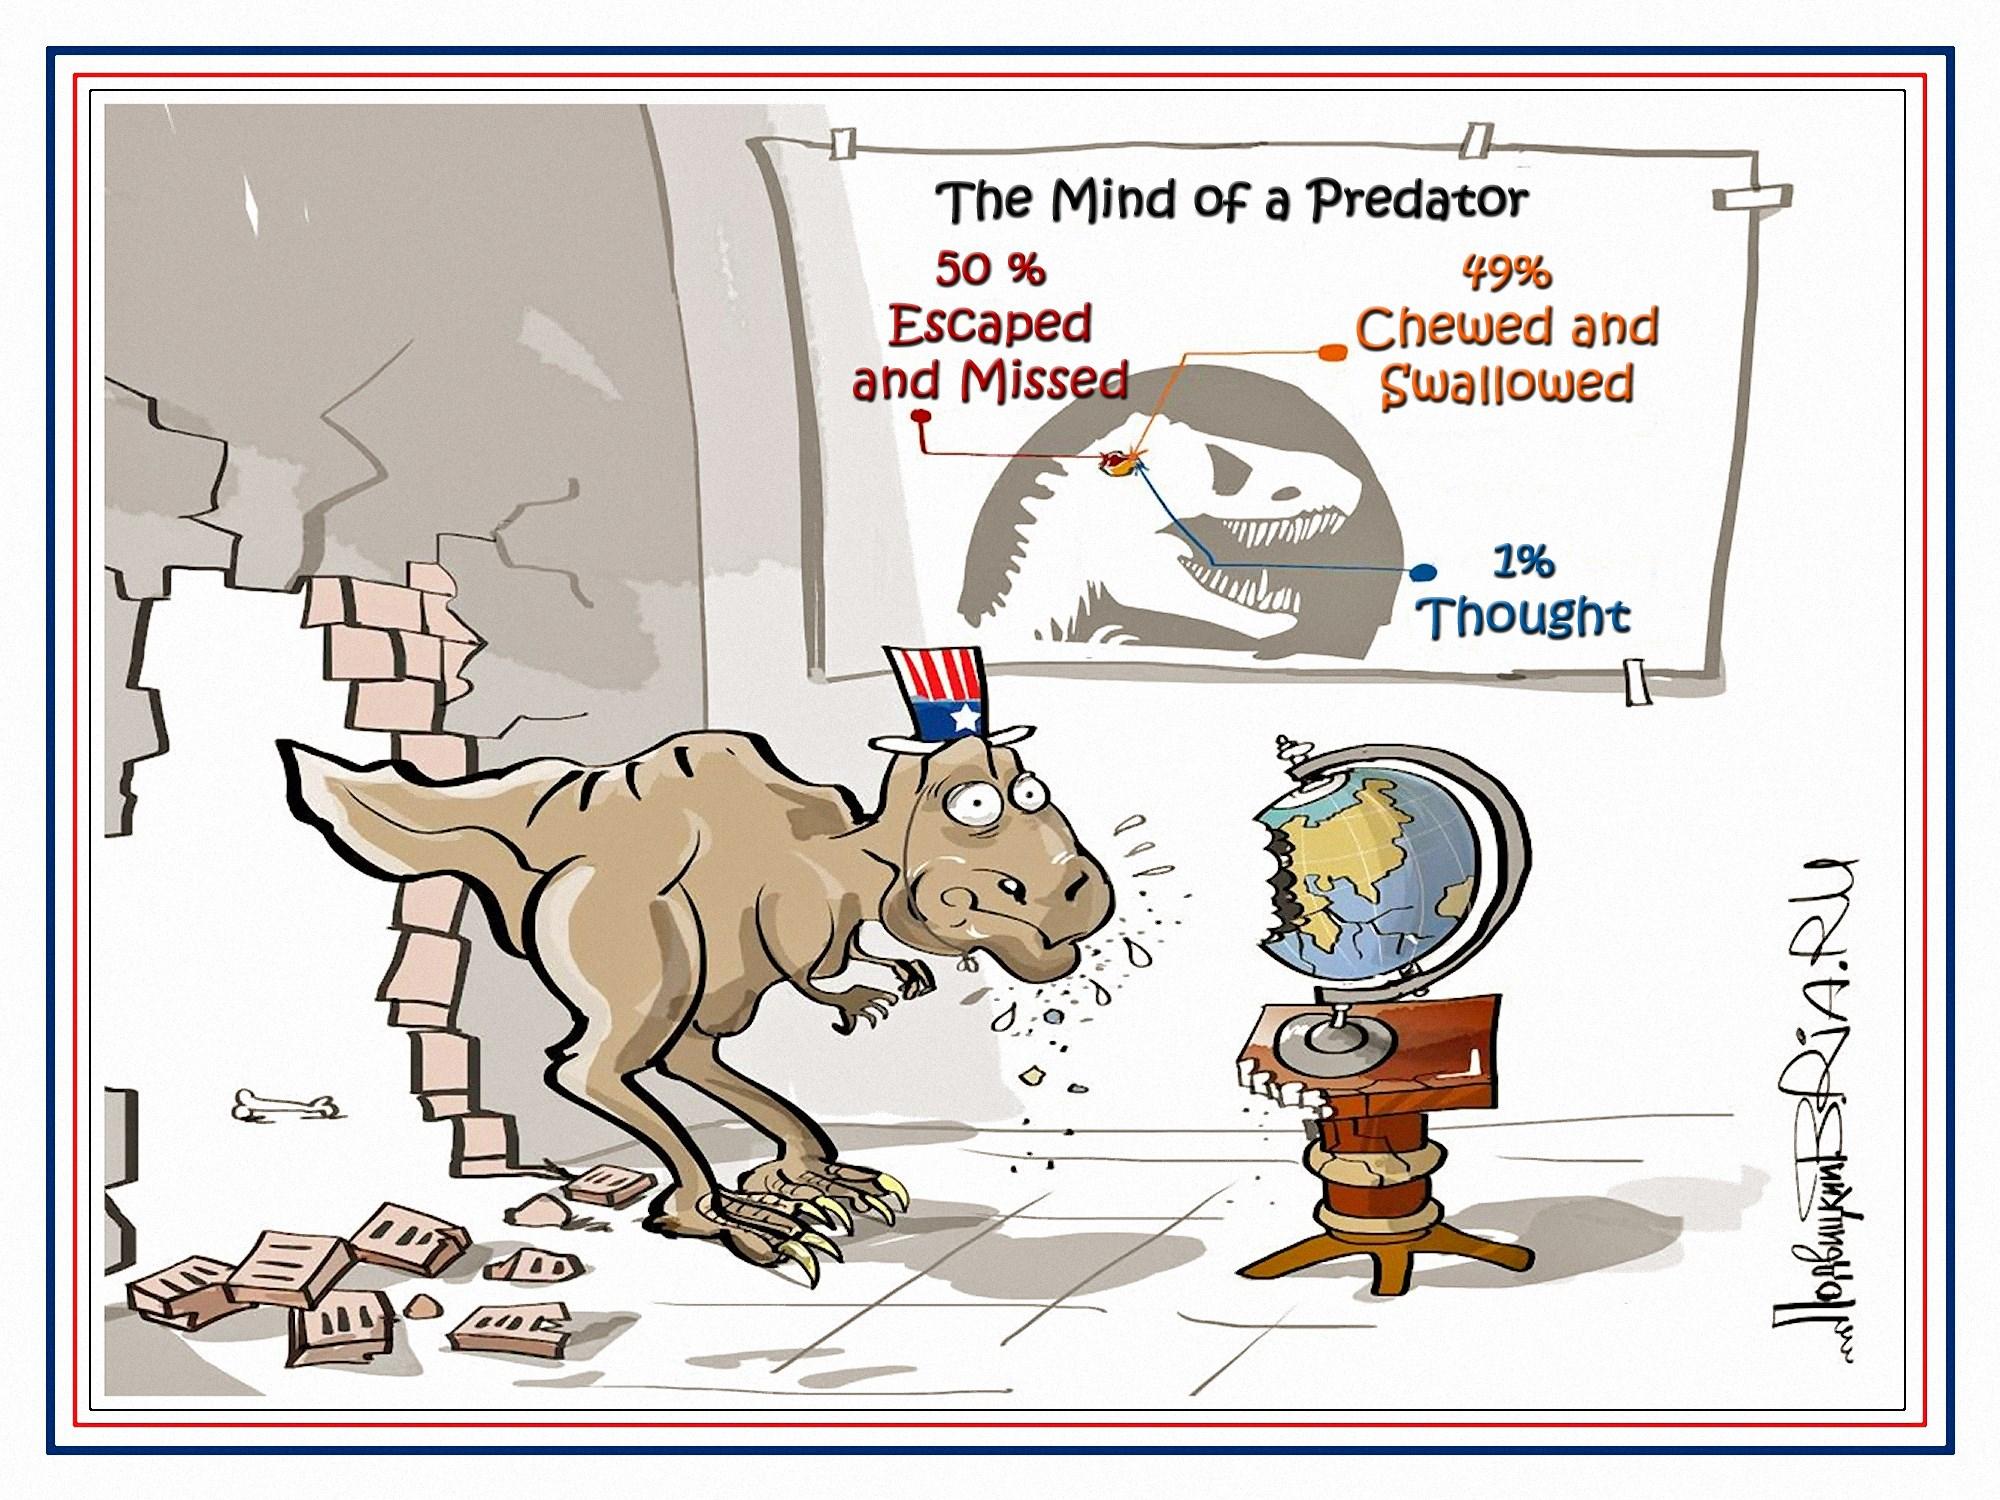 00 Vitaly Podvitsky. The Mind of a Predator. 2015